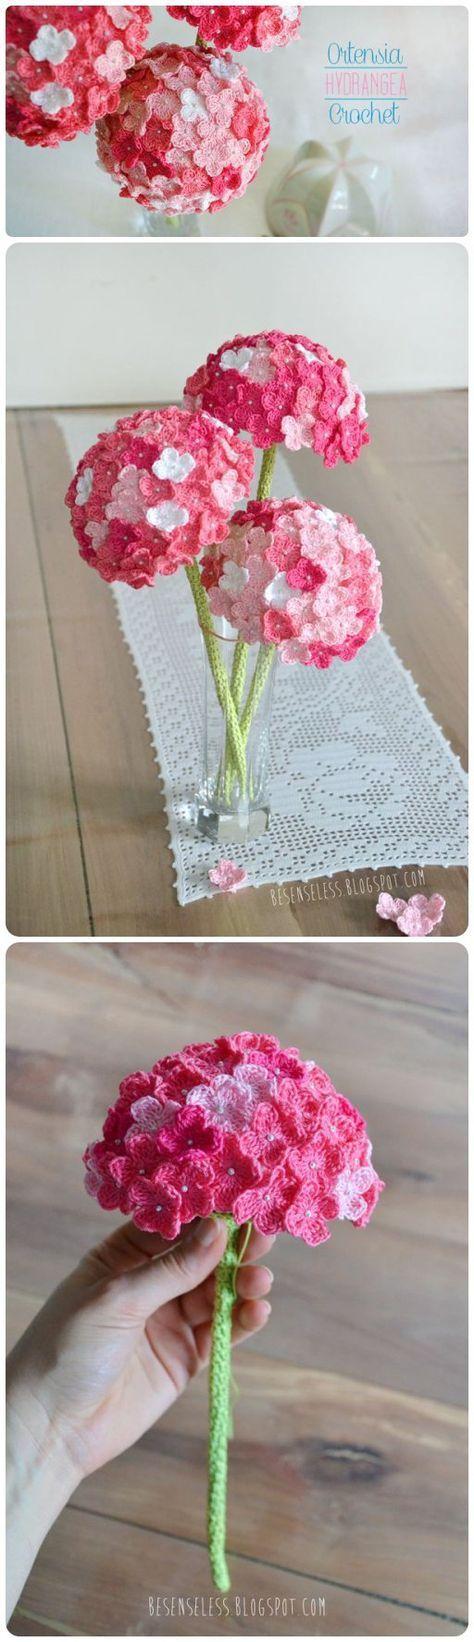 Crochet Hydrangea Flower with Free Pattern | Frei, Muster und Häkeln